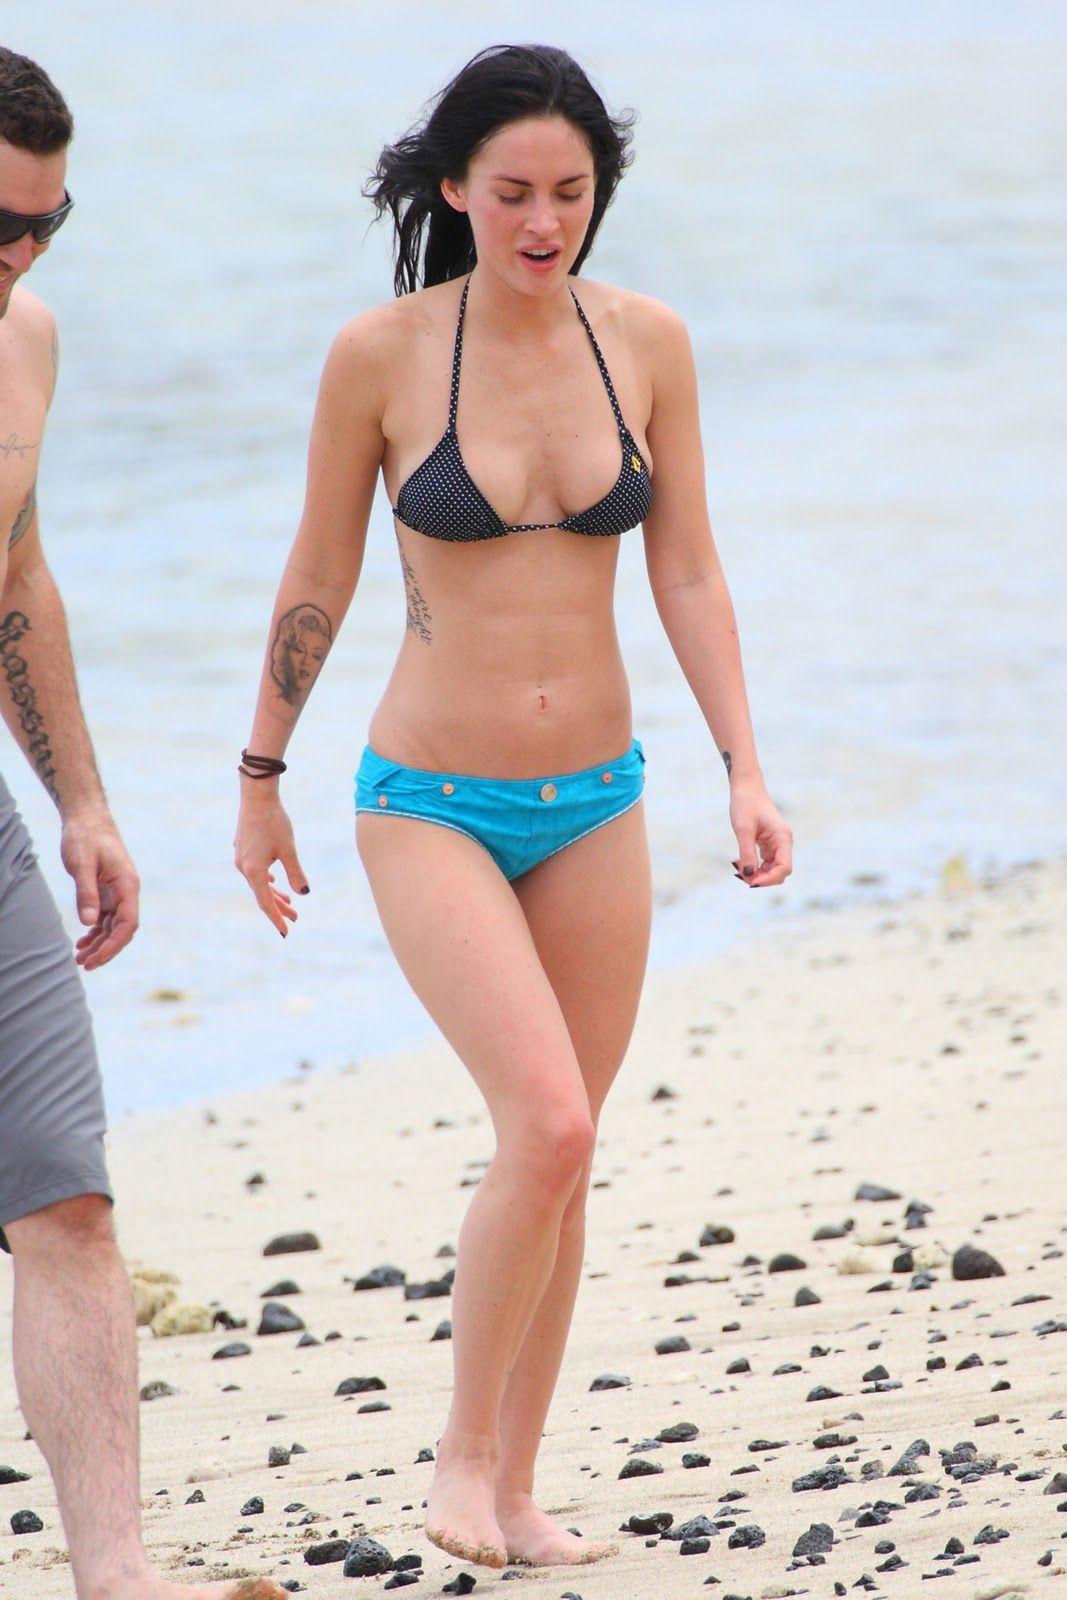 Hacked Megan Fox nudes (19 photo), Sexy, Cleavage, Instagram, bra 2020